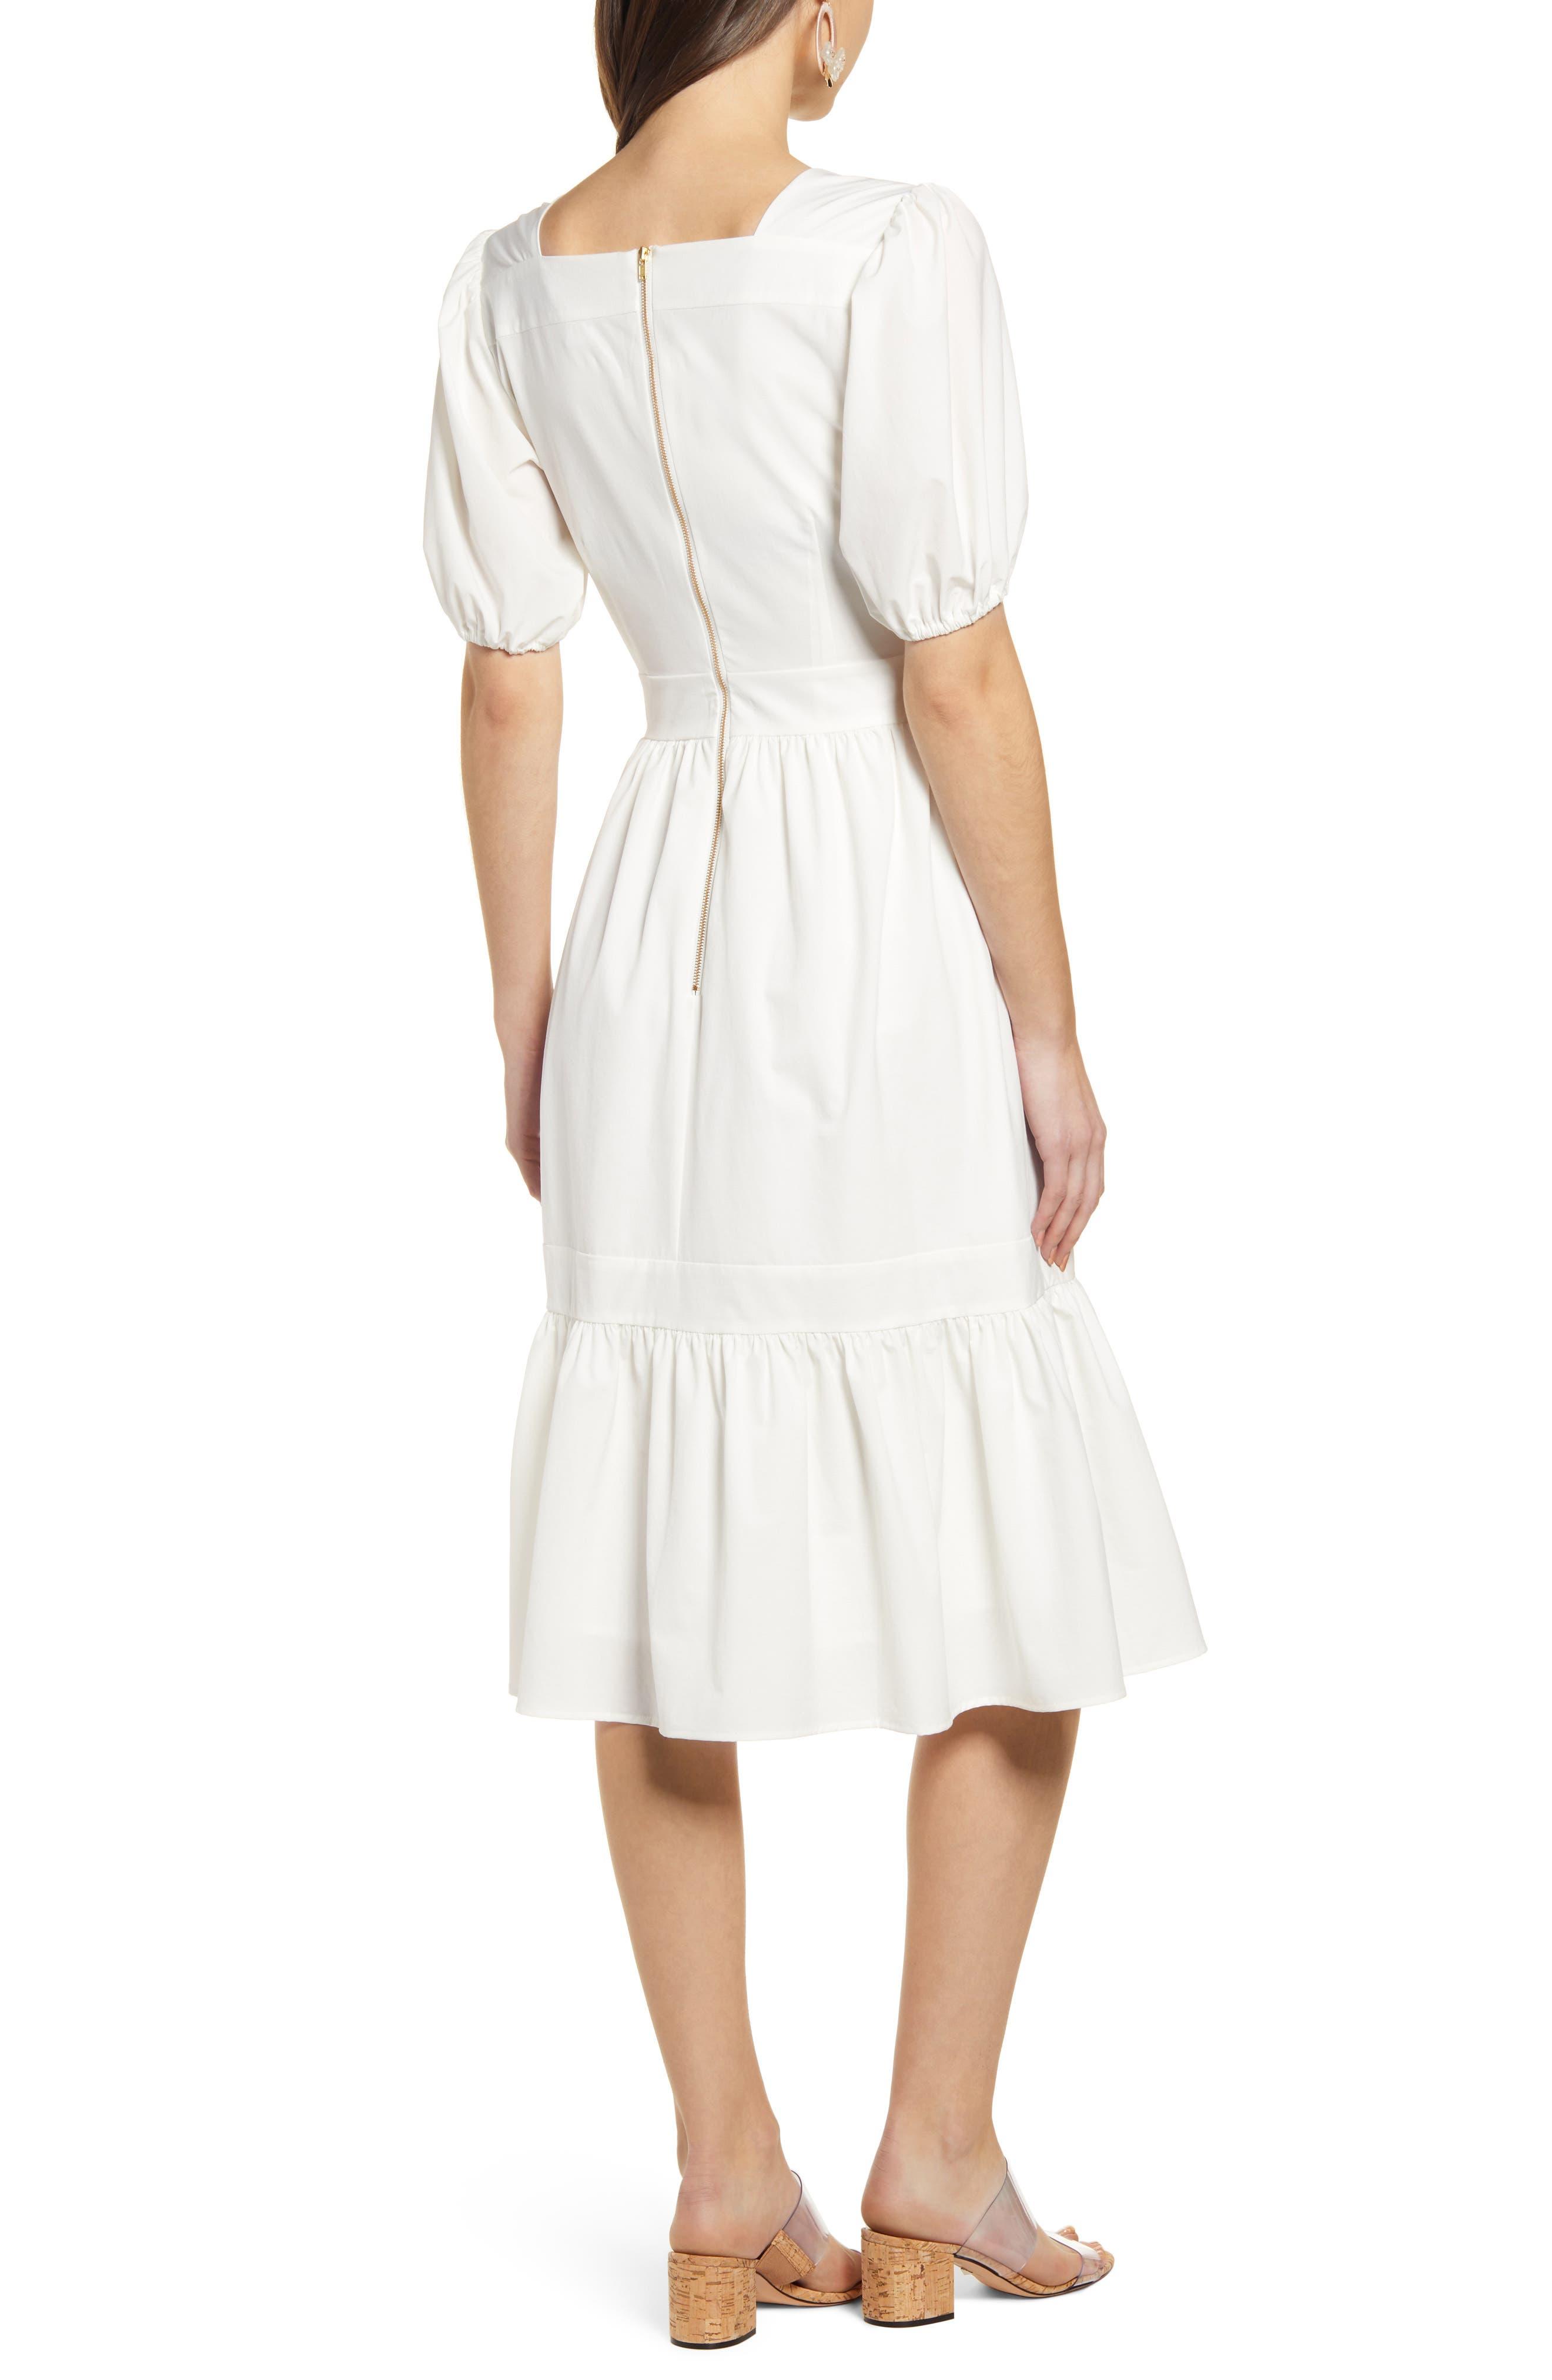 d431b82f48 New Women s White Clothing